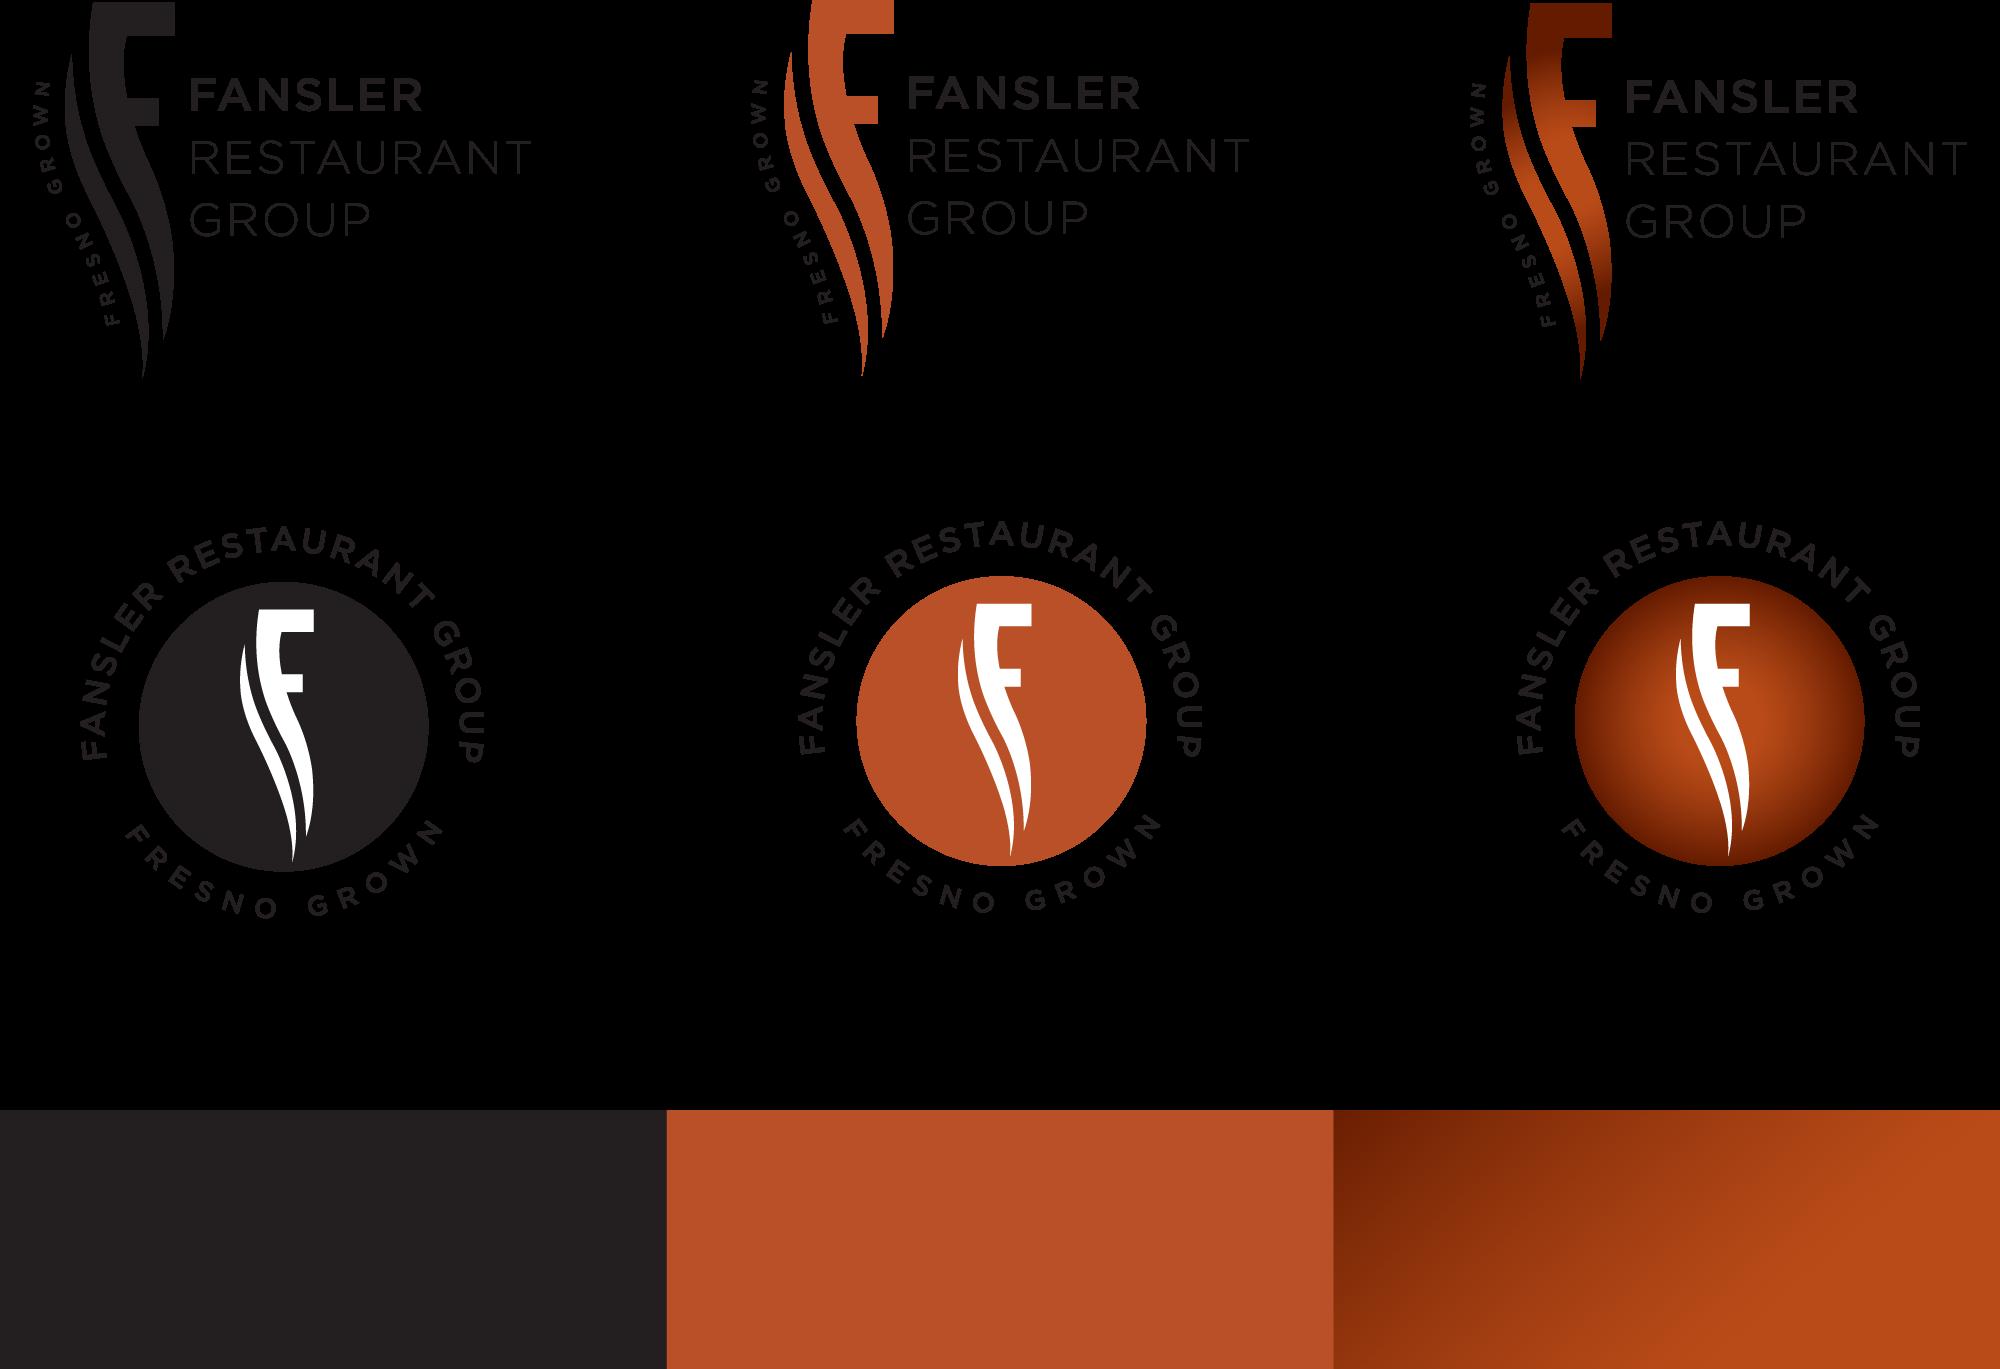 FCG_FRG_Logos_and_Colors